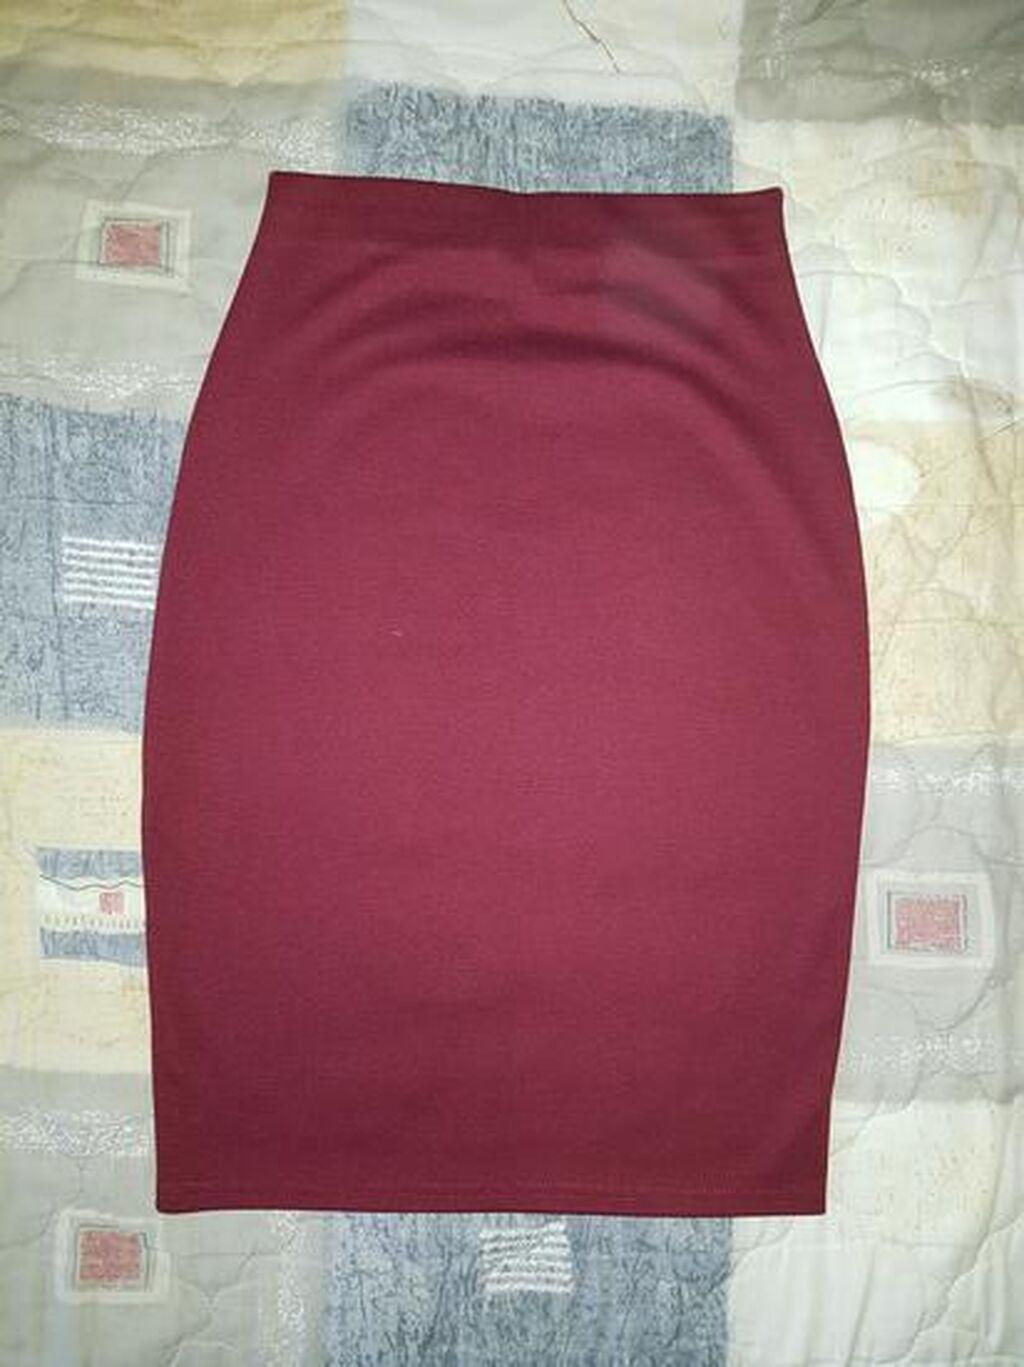 Ženska suknja do kolena Svaka po 600, obe 1000